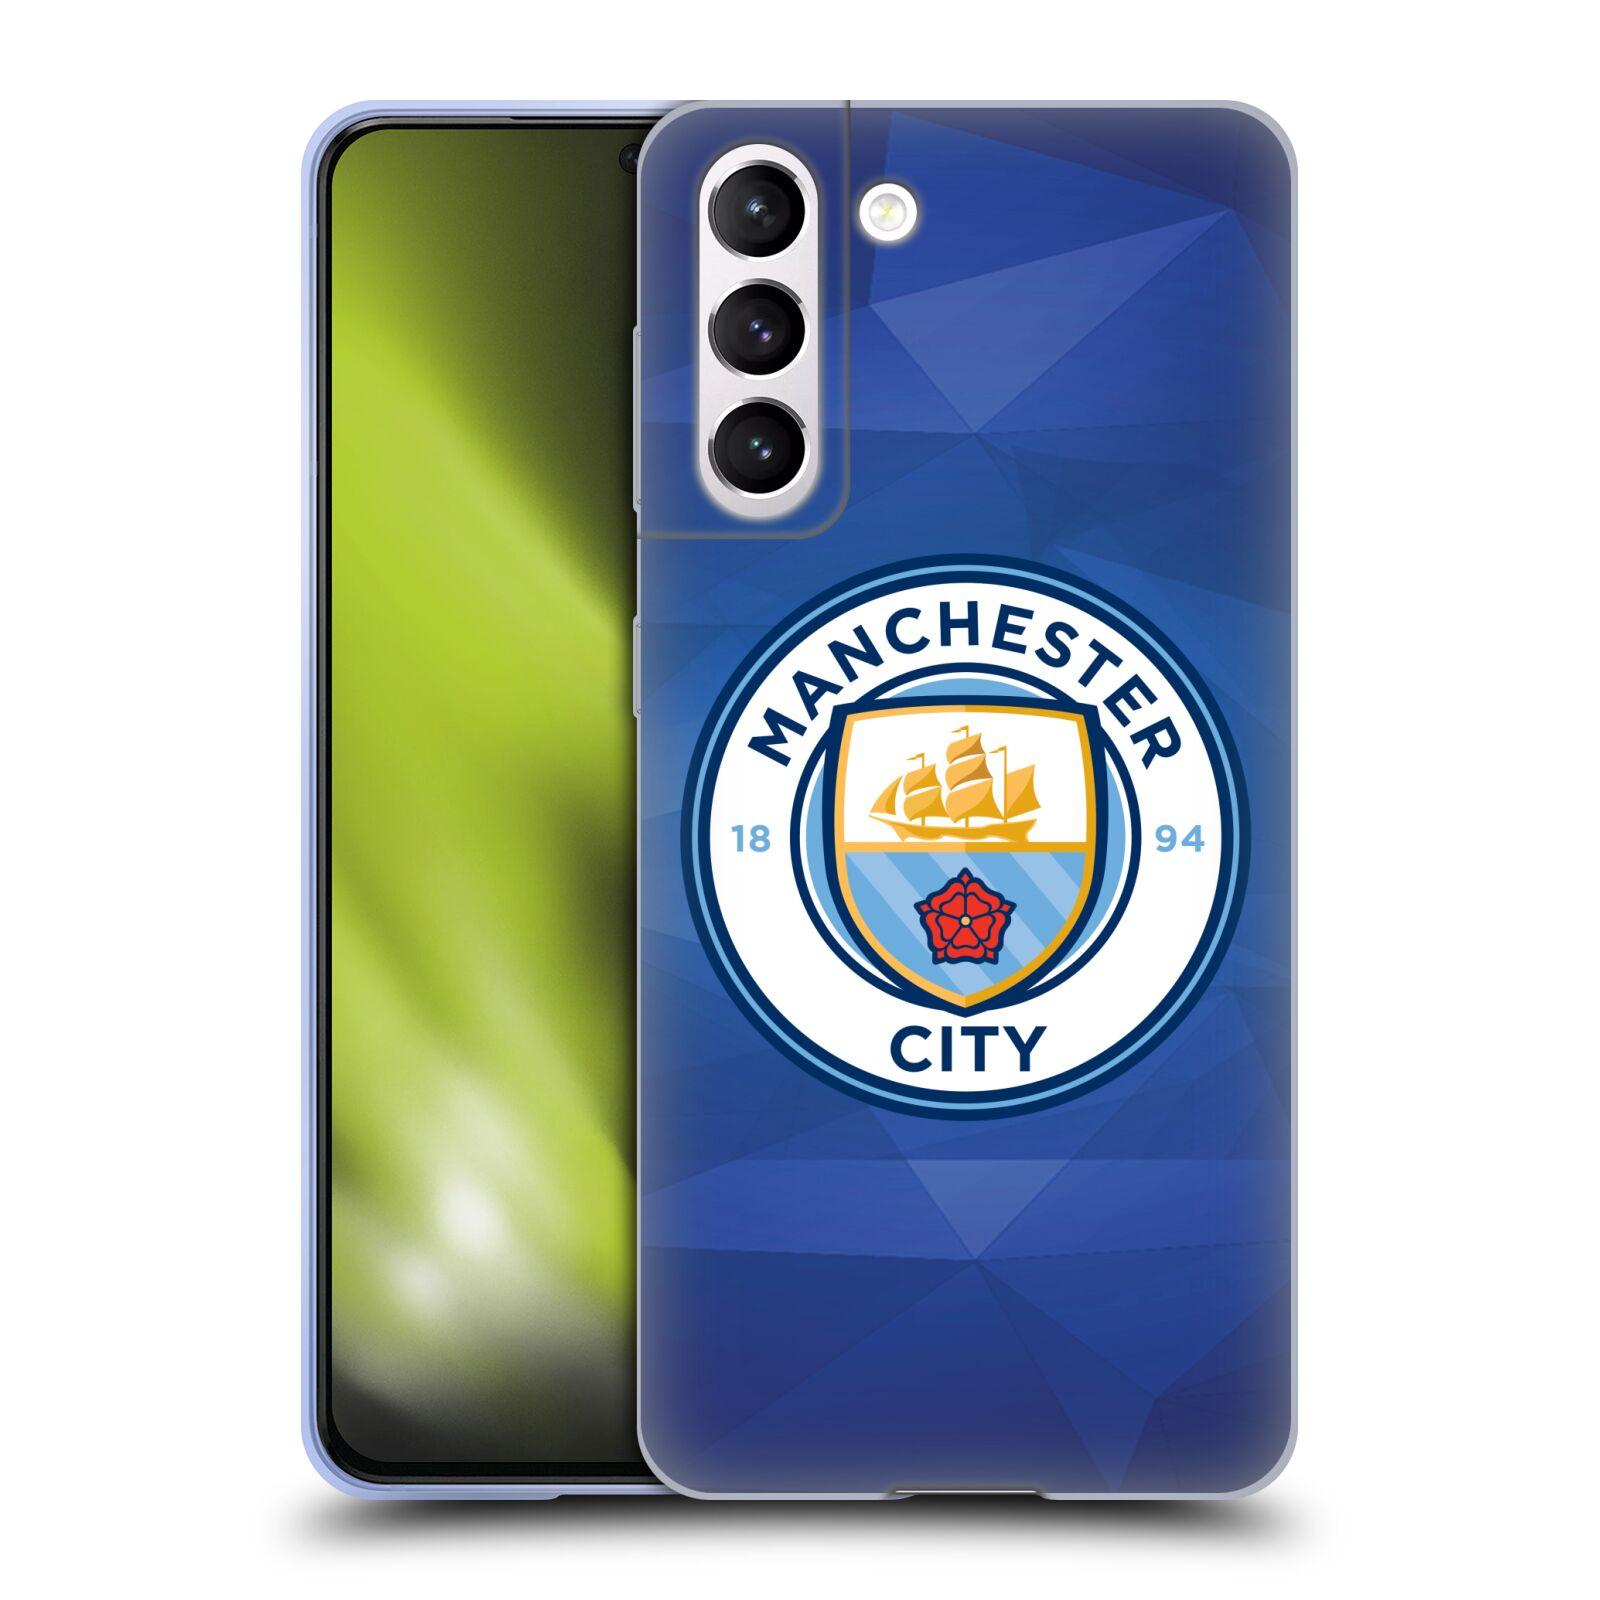 Silikonové pouzdro na mobil Samsung Galaxy S21 5G - Head Case - Manchester City FC - Modré nové logo